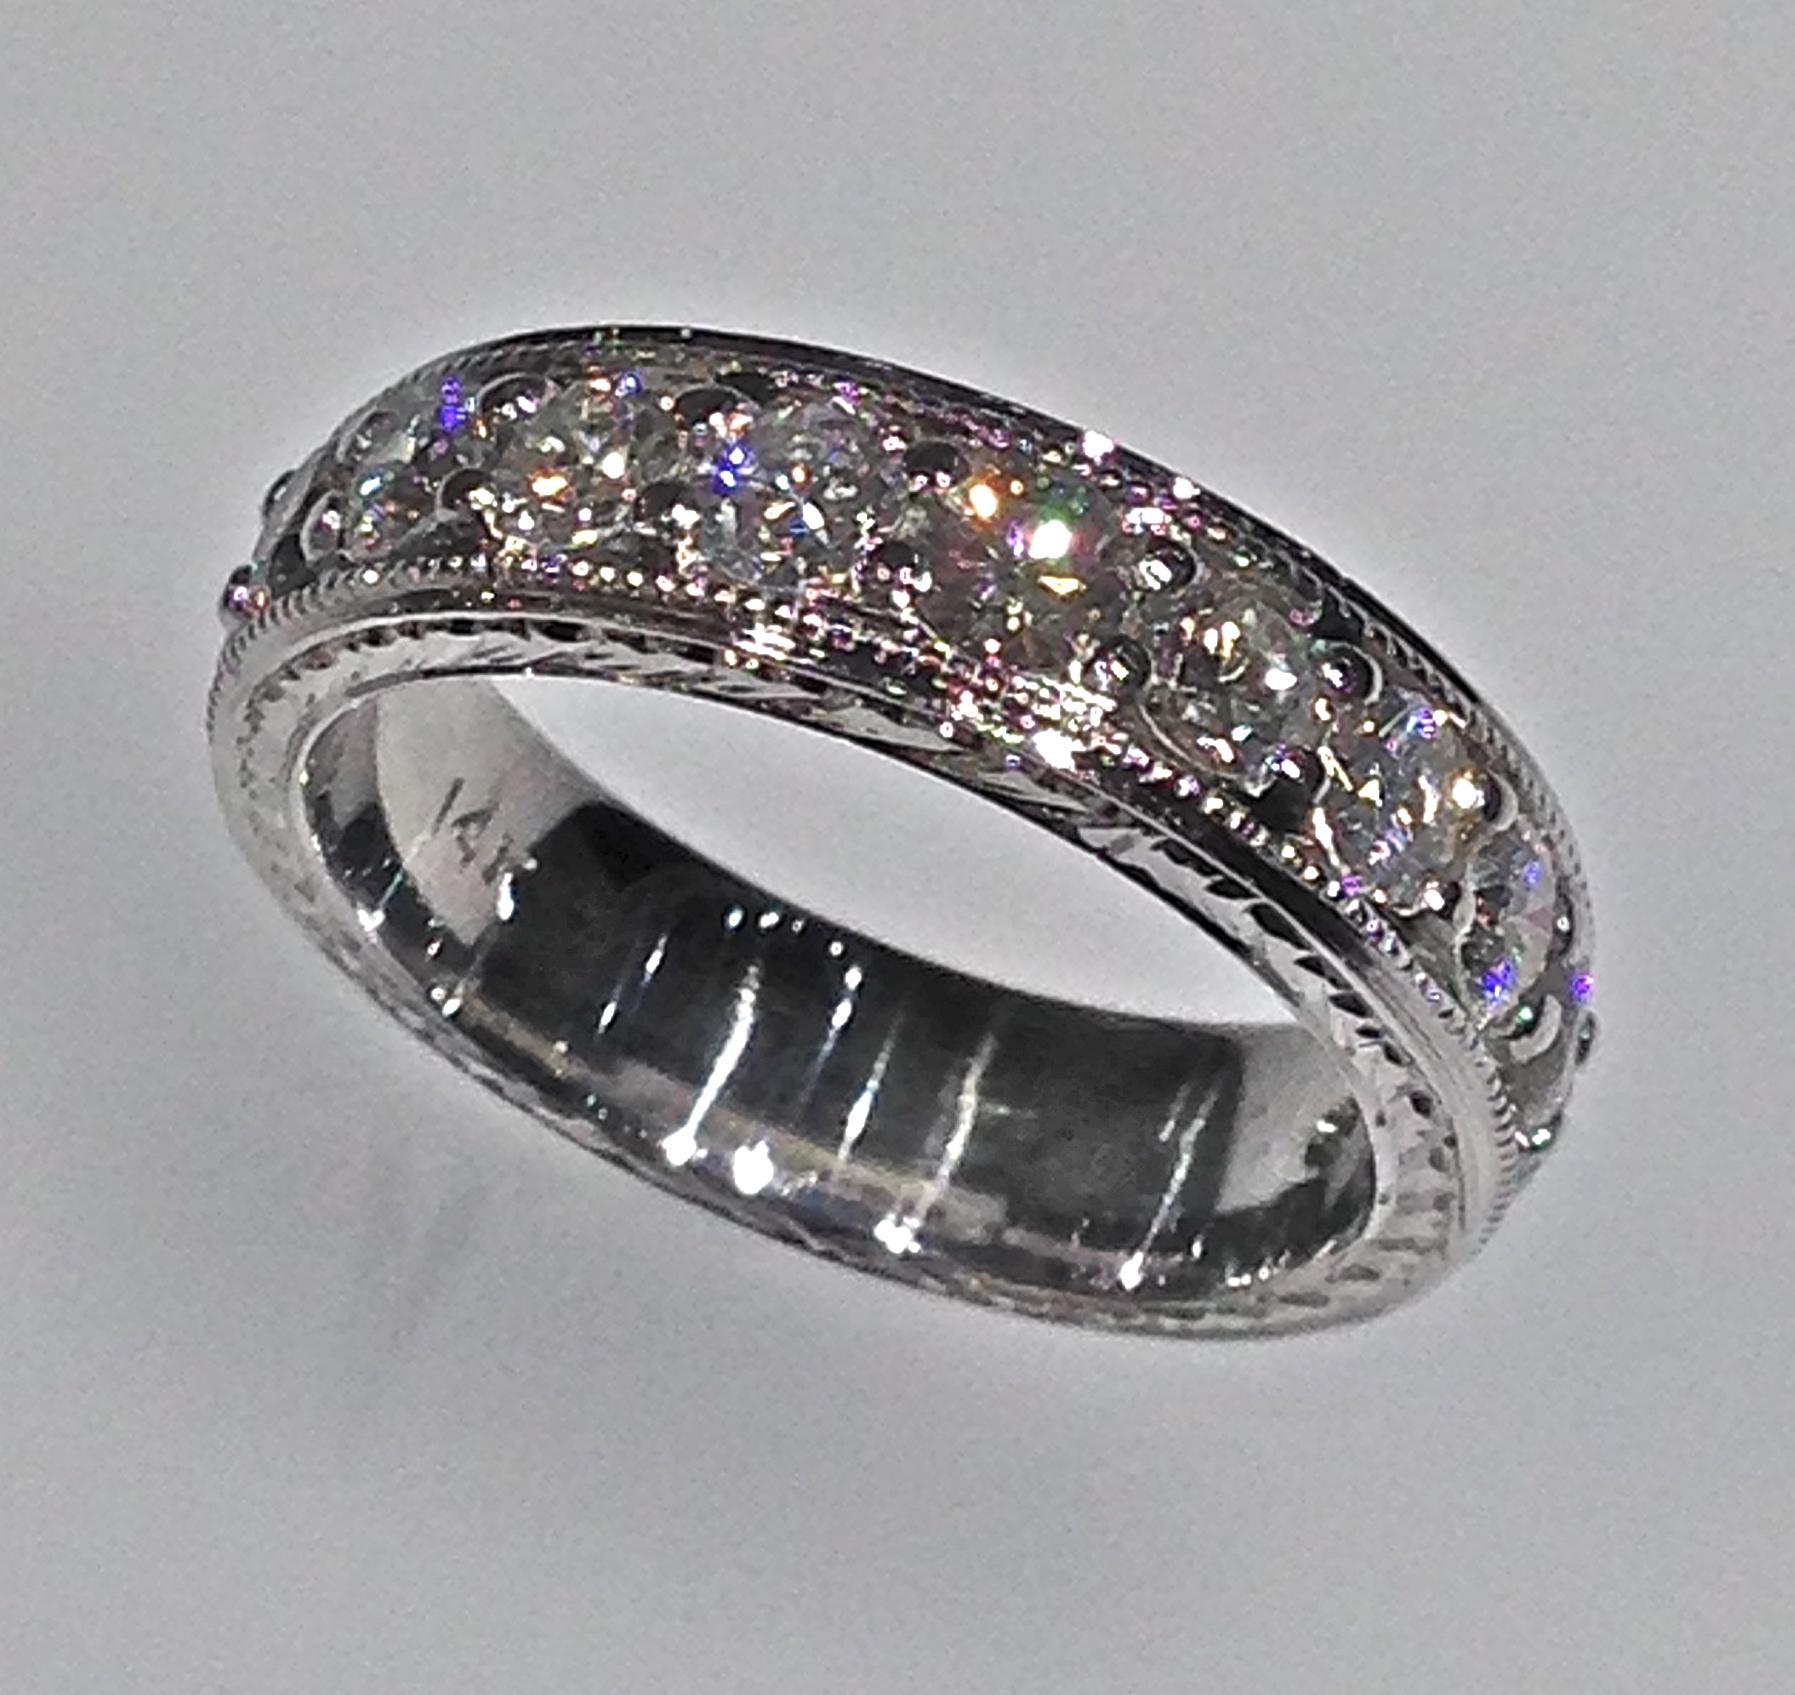 wedding bands 1 1 neil lane wedding bands craft revival jewelers diamond wedding band antique edding